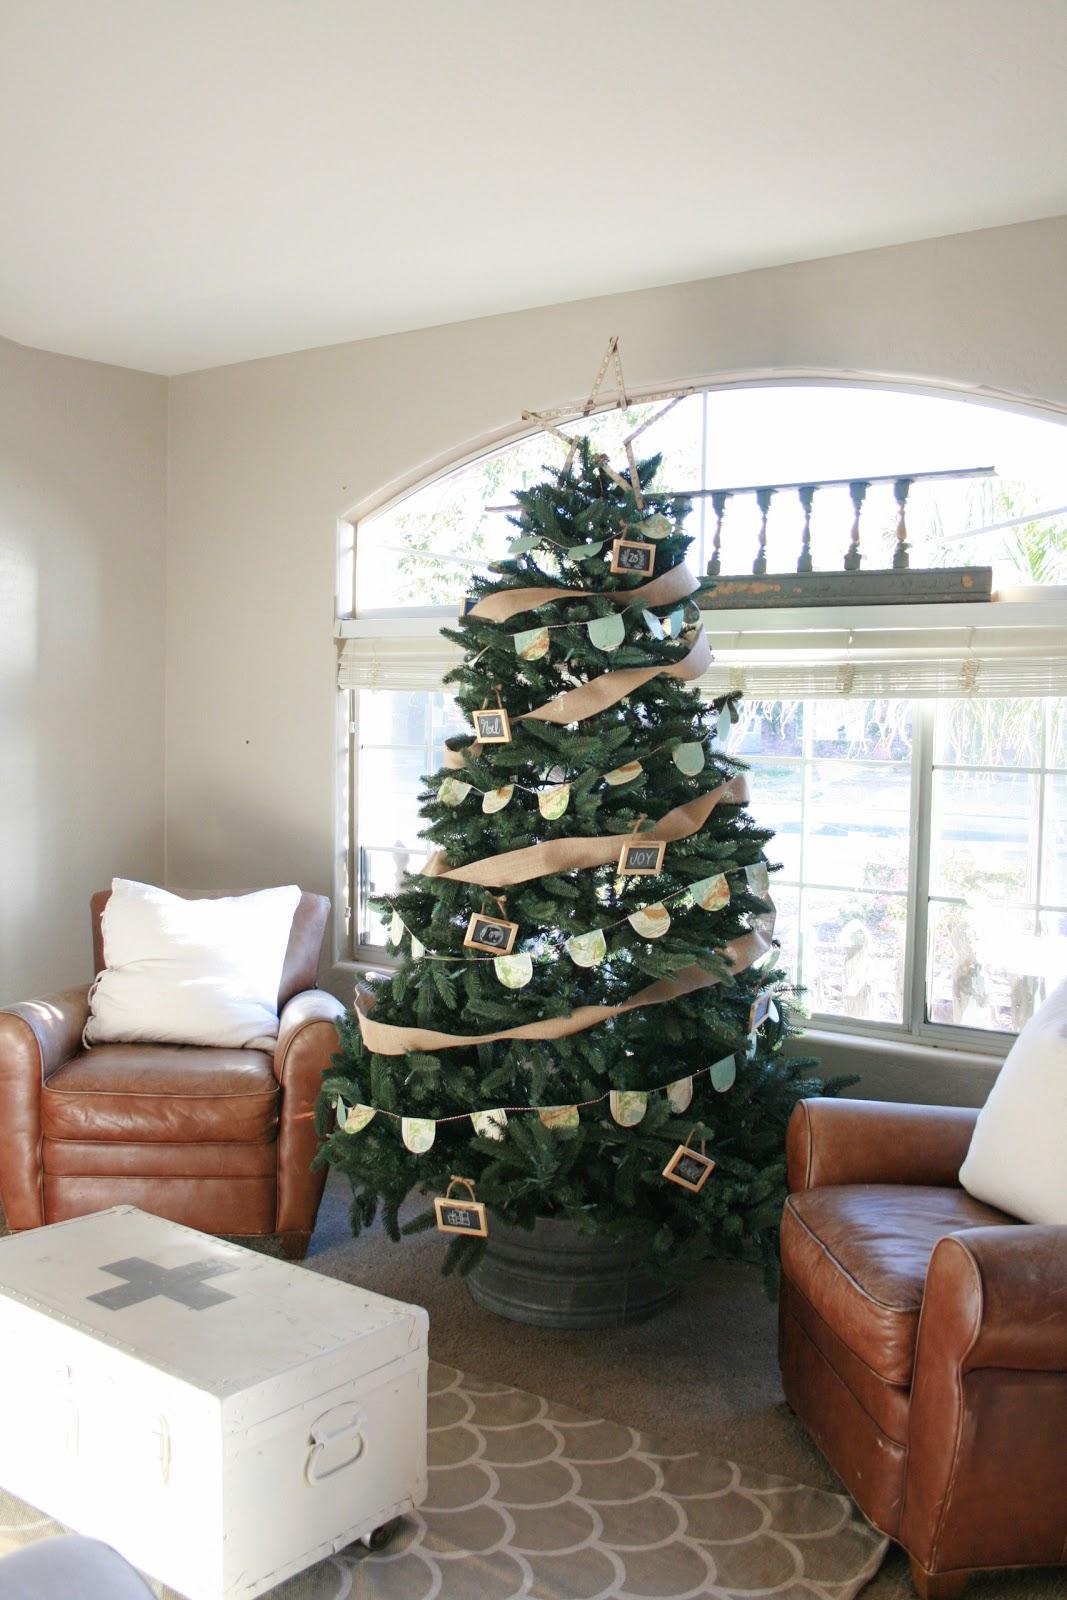 Grand Design: Oh Christmas tree